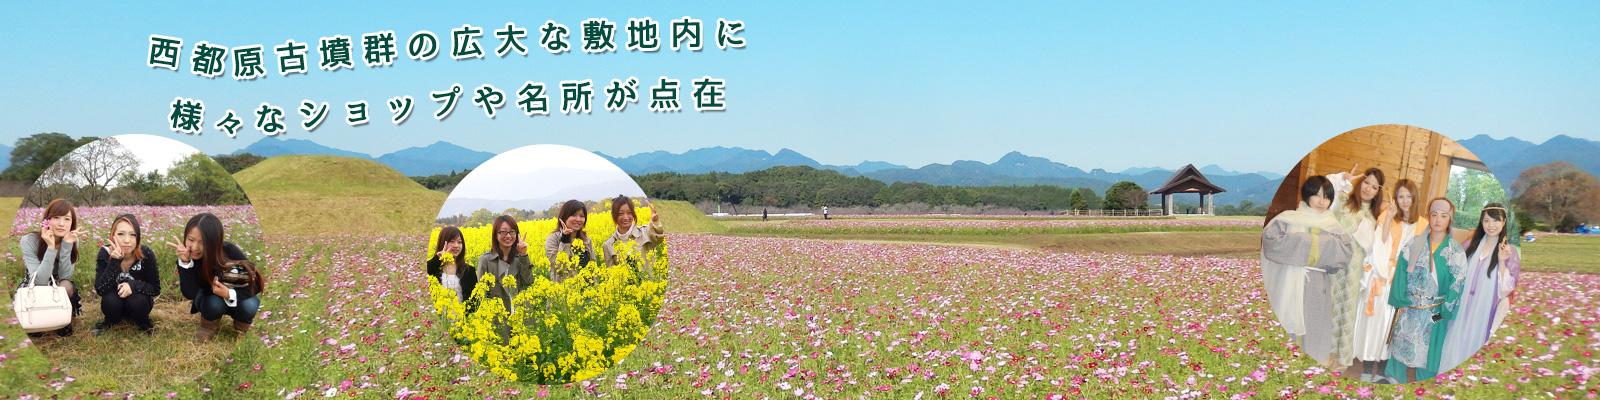 合宿免許お客様と行く宮崎観光ツアー【日南編】/西都自動車学校